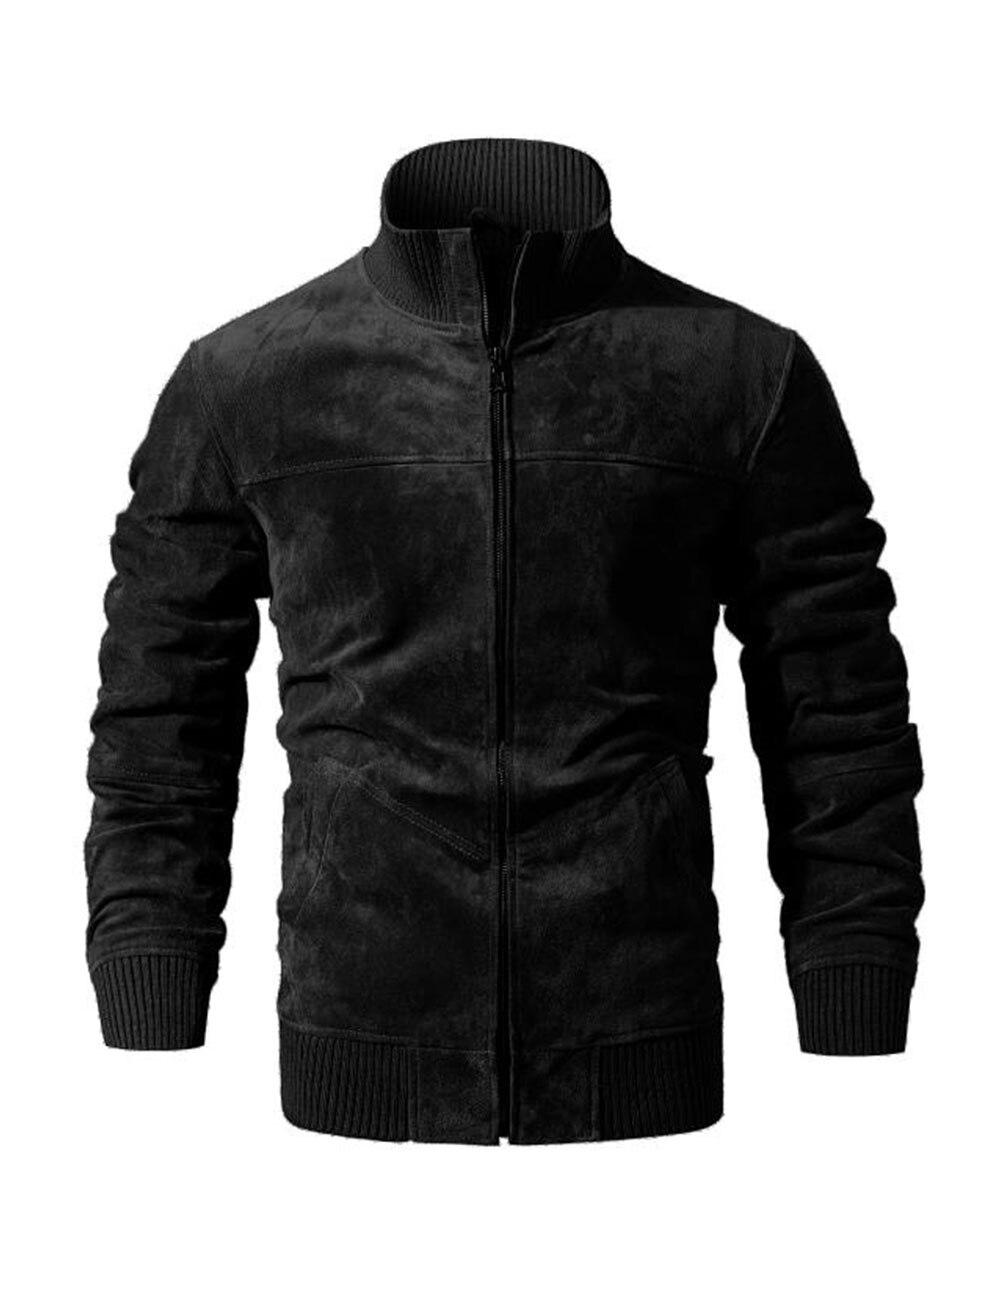 HTB1 OKMFL1TBuNjy0Fjq6yjyXXah FLAVOR Men's Real Leather Jacket Men Pigskin Slim Fit Genuine Leather Coat With Rib Cuff Standing Collar